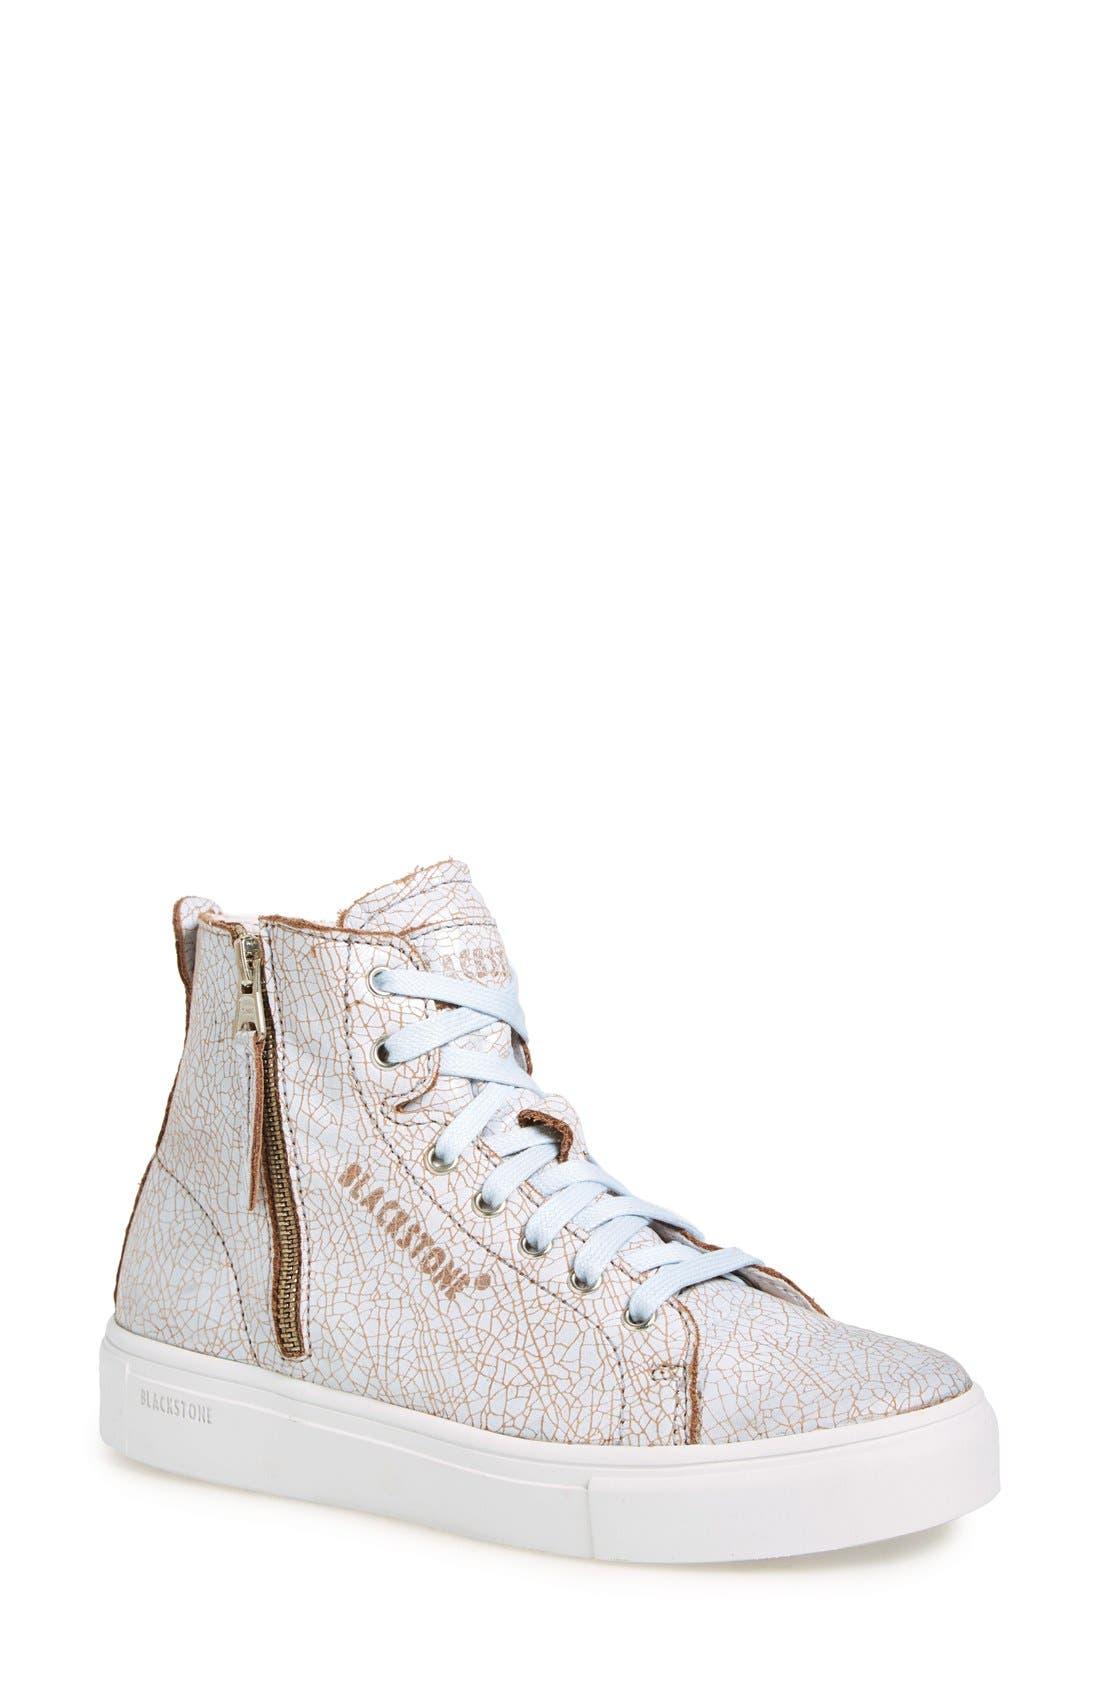 BLACKSTONE LL78 Crackled High Top Platform Sneaker